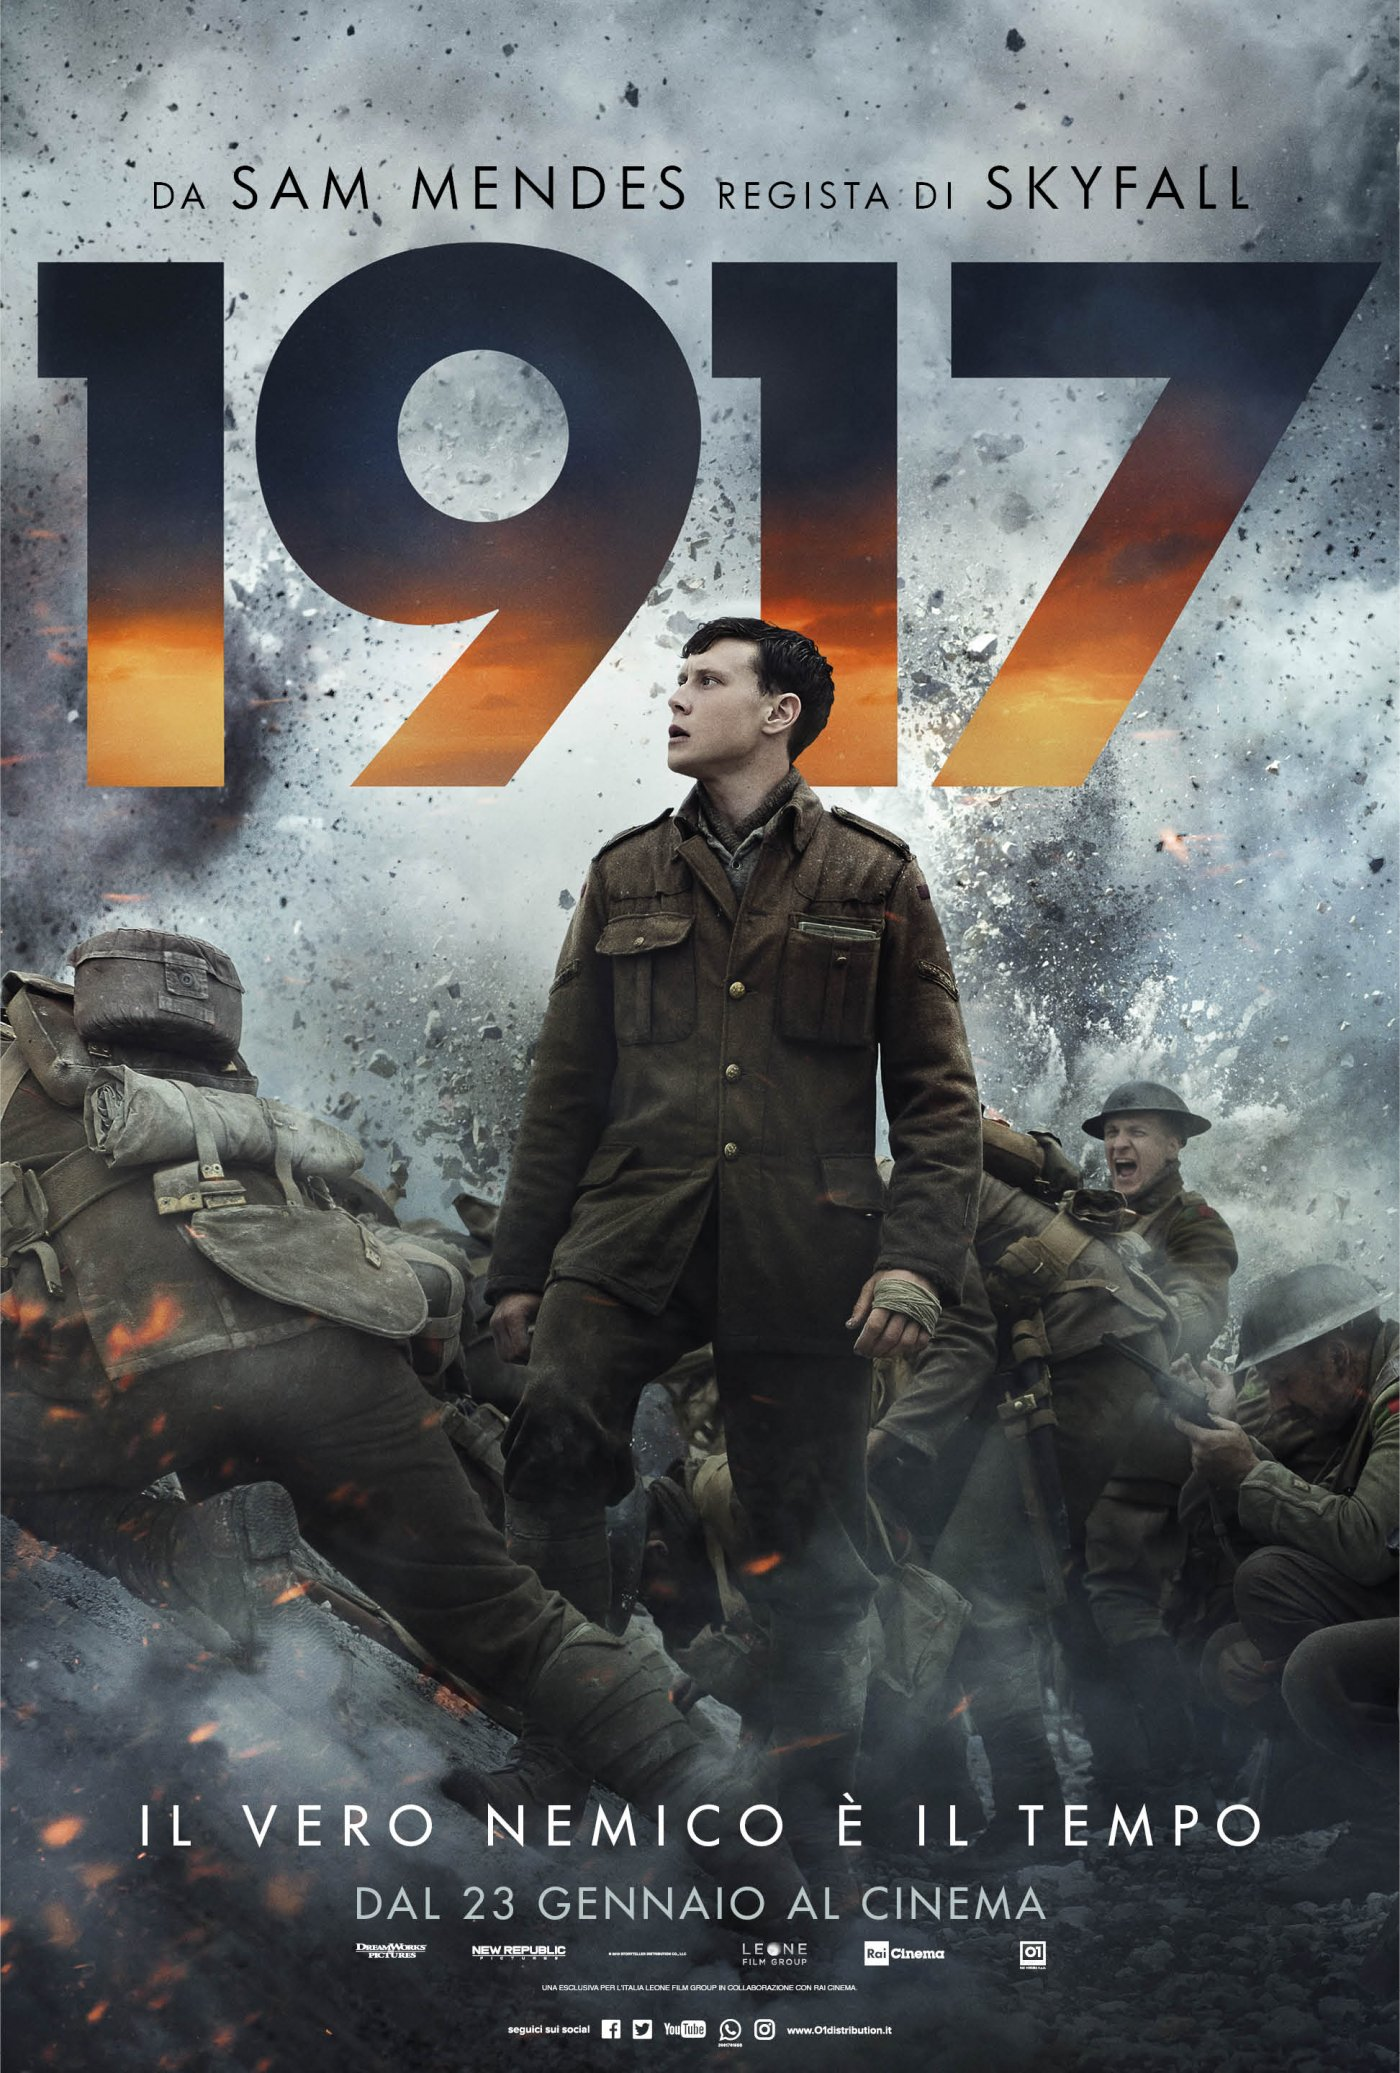 https://movieplayer.it/film/1917_50649/